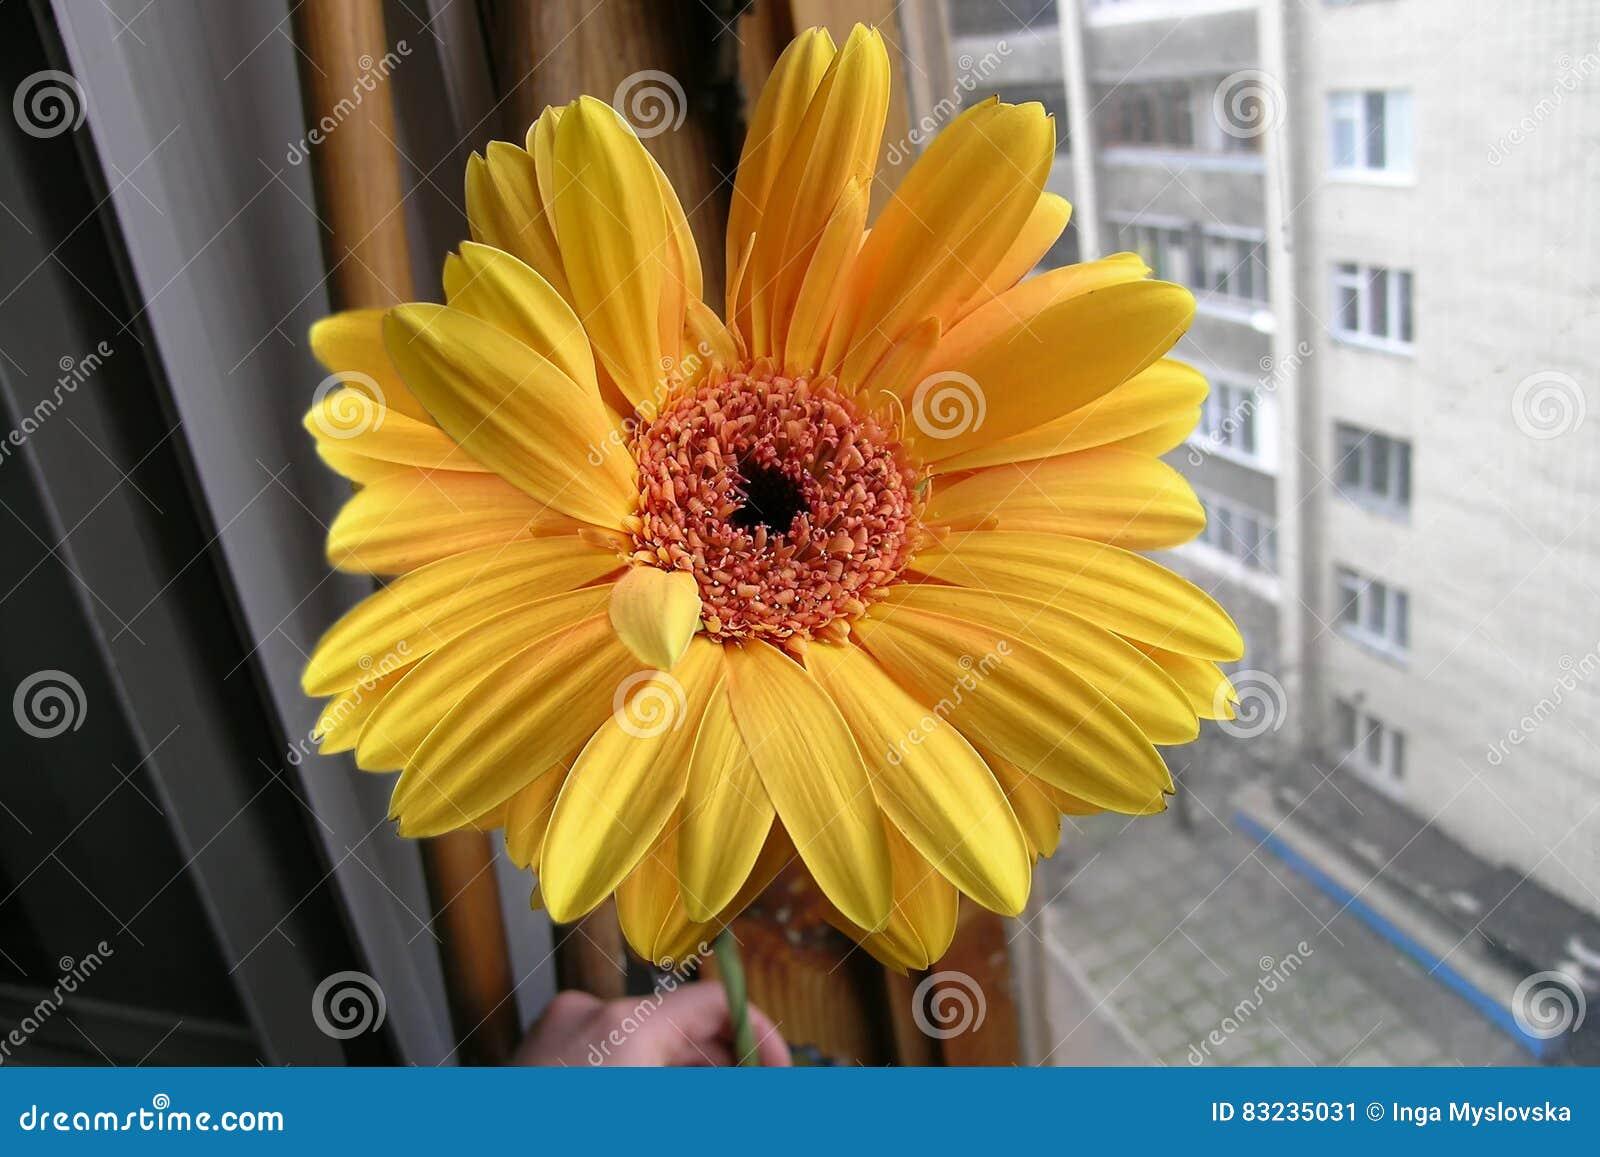 Yellow orange Gerbera at window